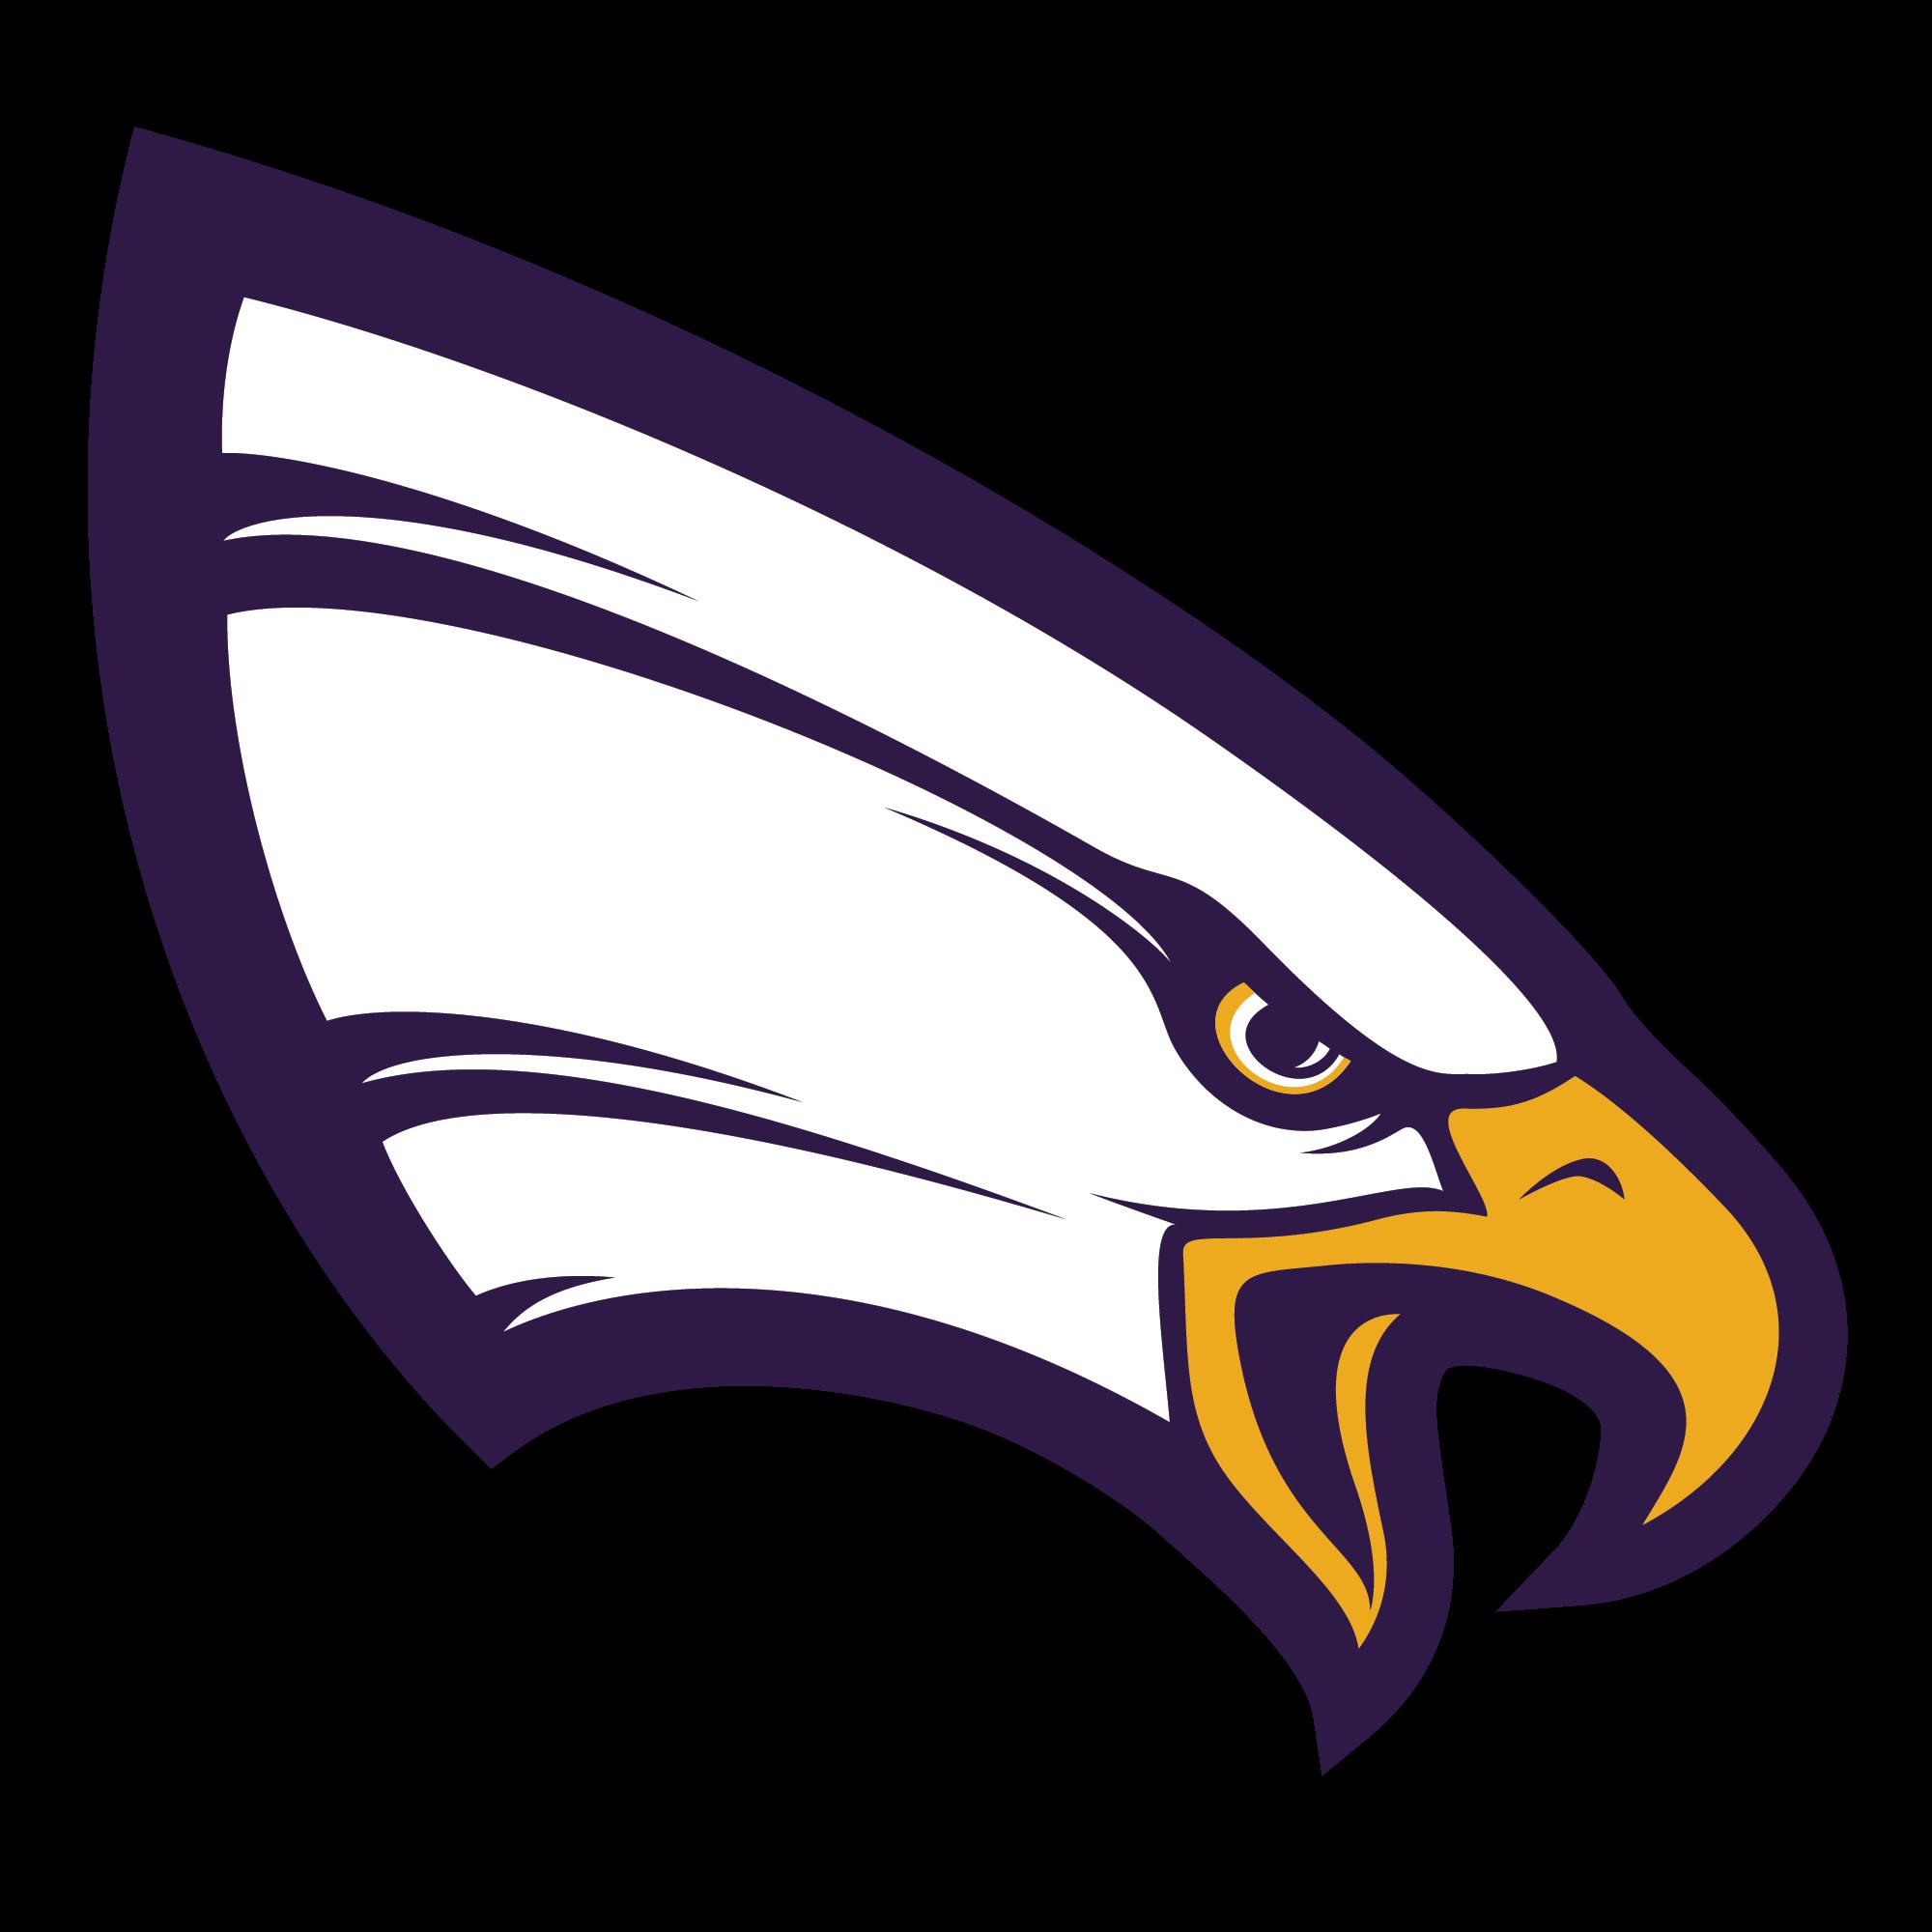 Eagles clipart eagle profile. Image gcb g gr